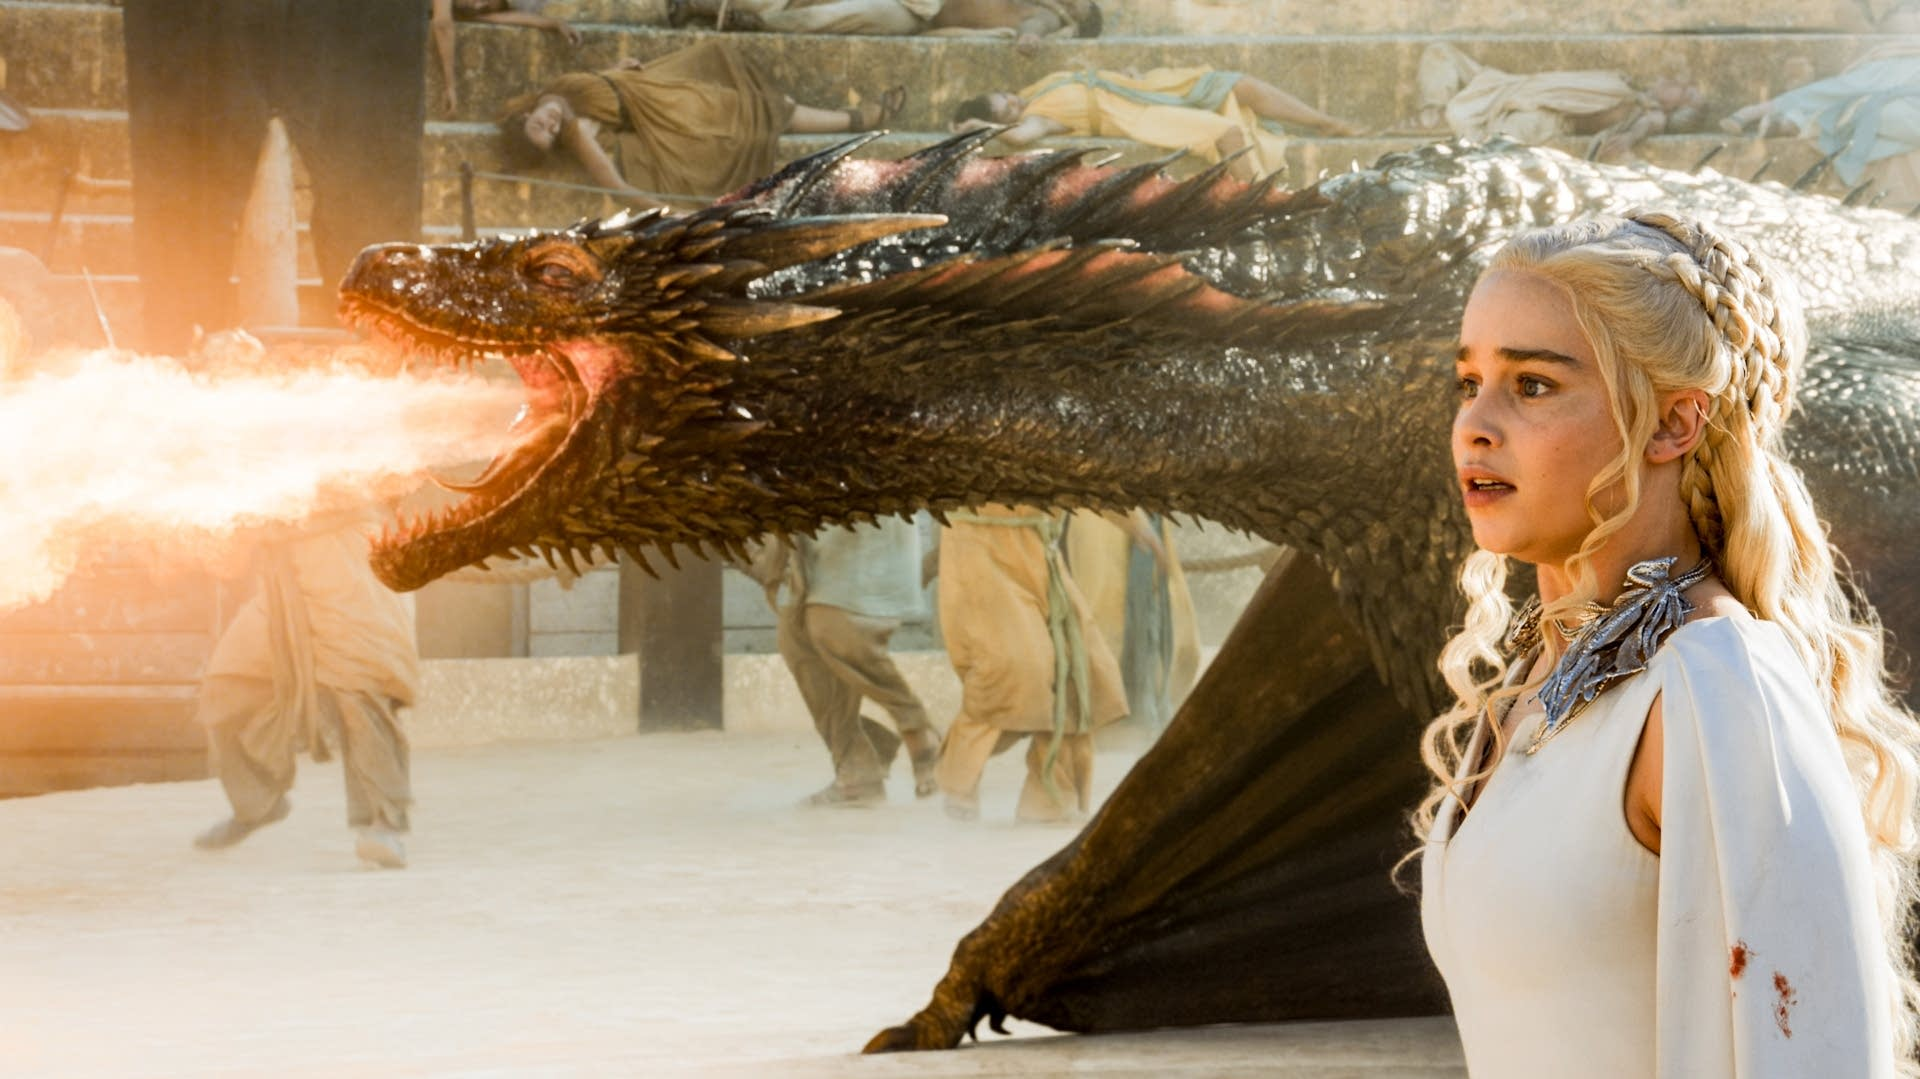 Emilia Clarke stars as Daenerys Targaryen